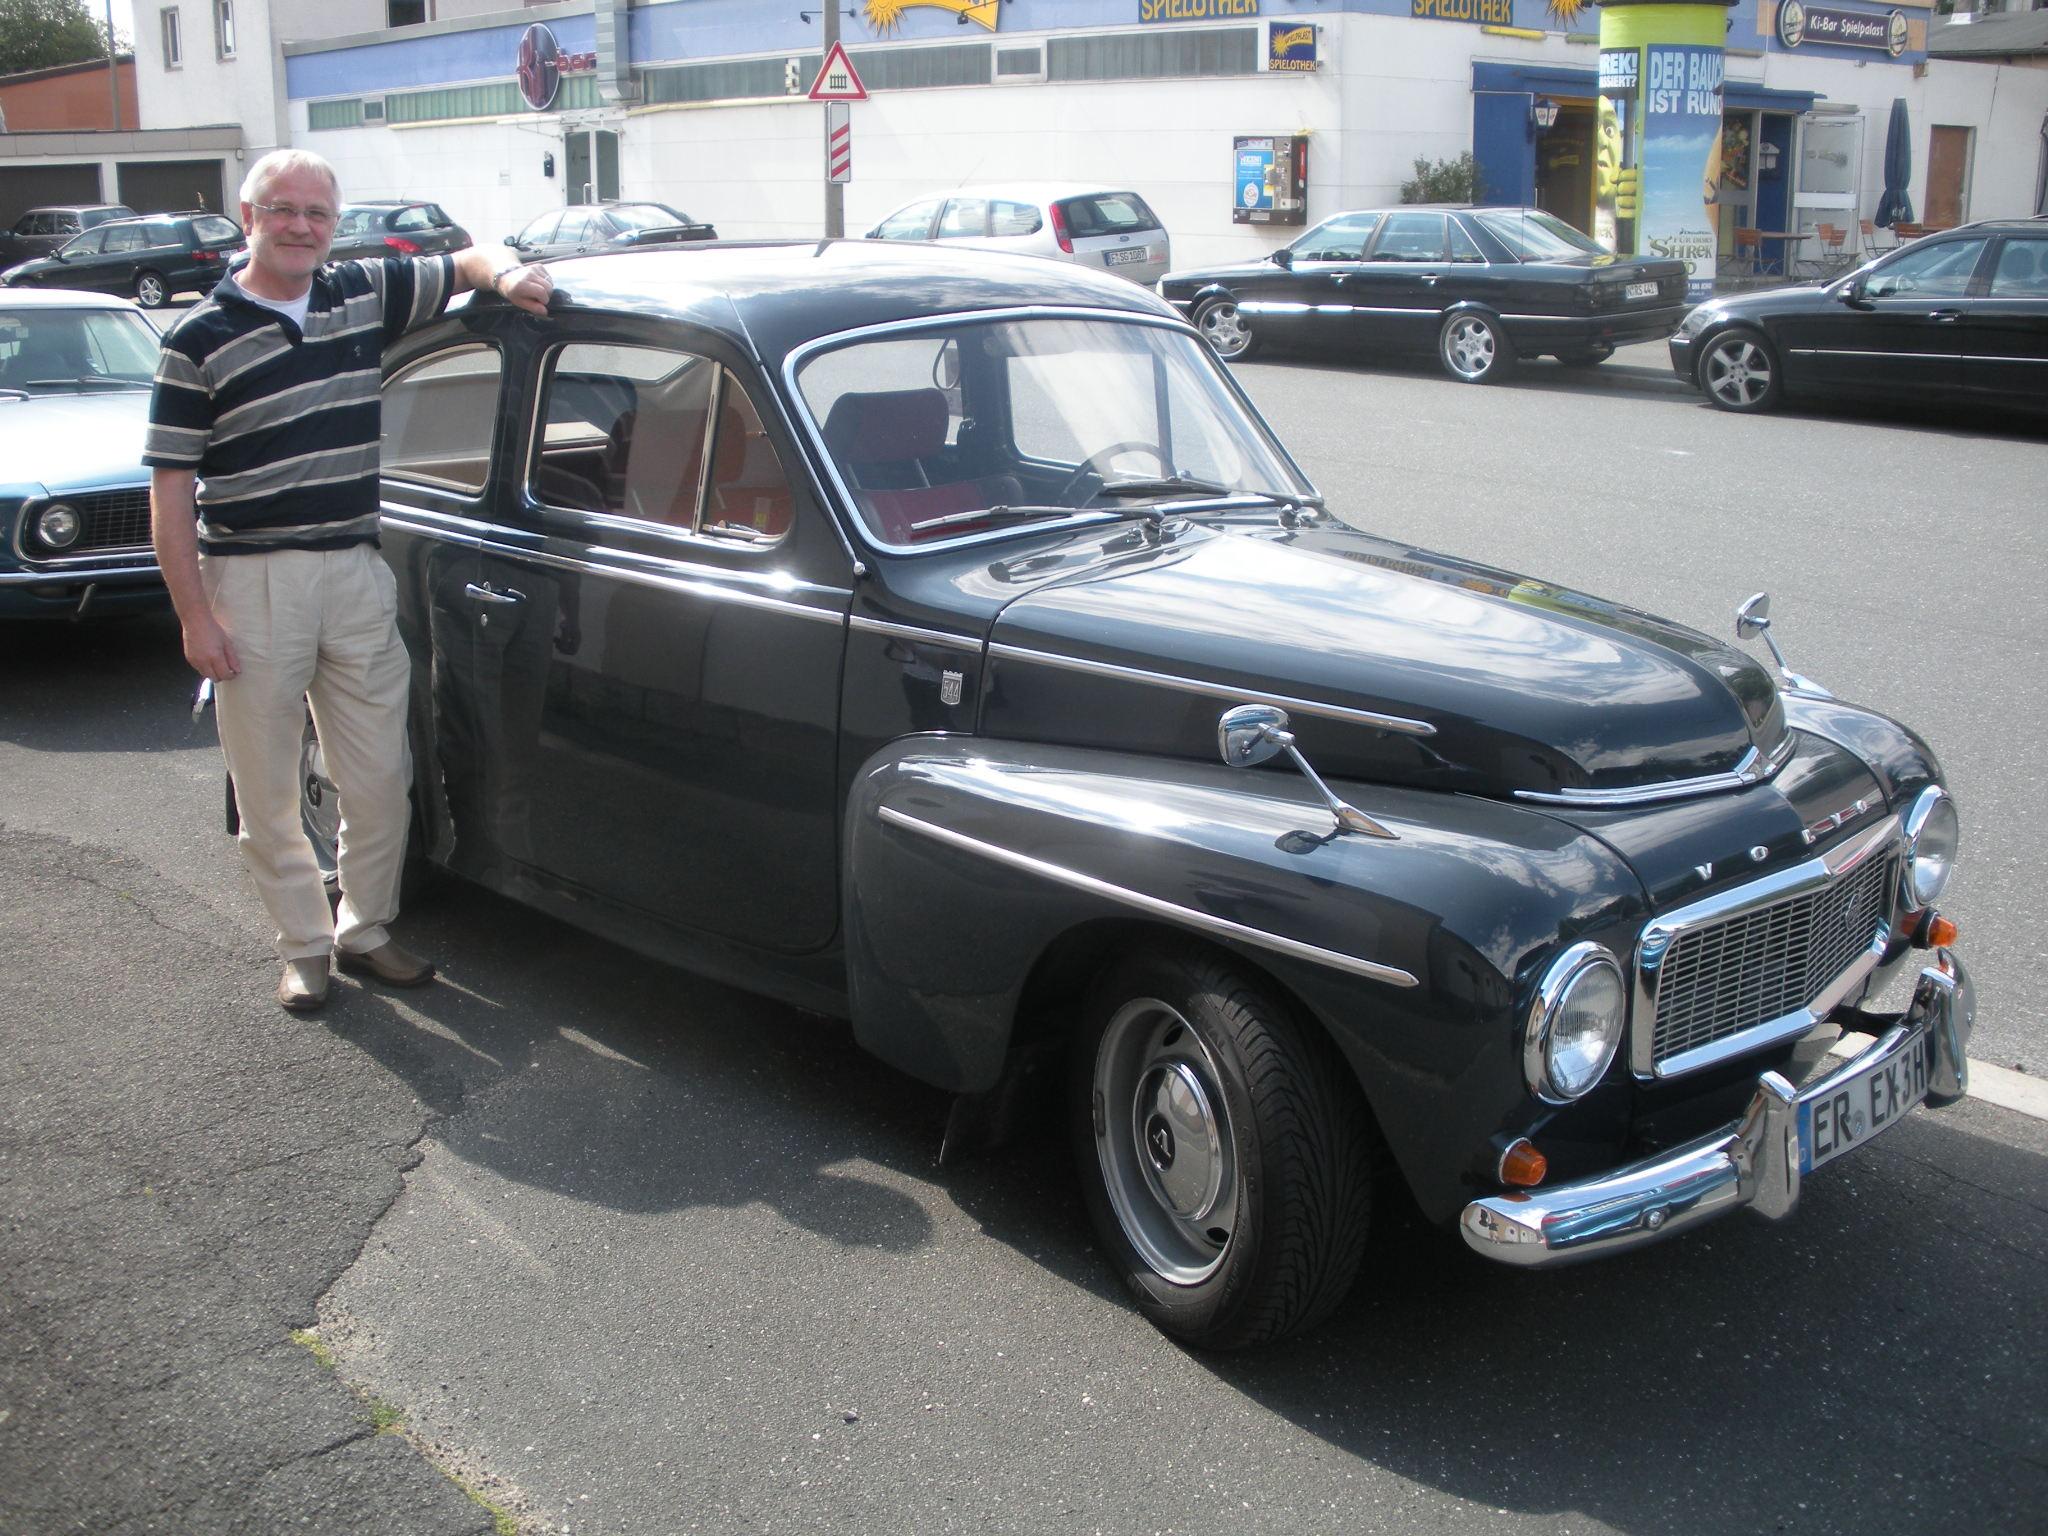 Jürgen with his 1965 Volvo PV544